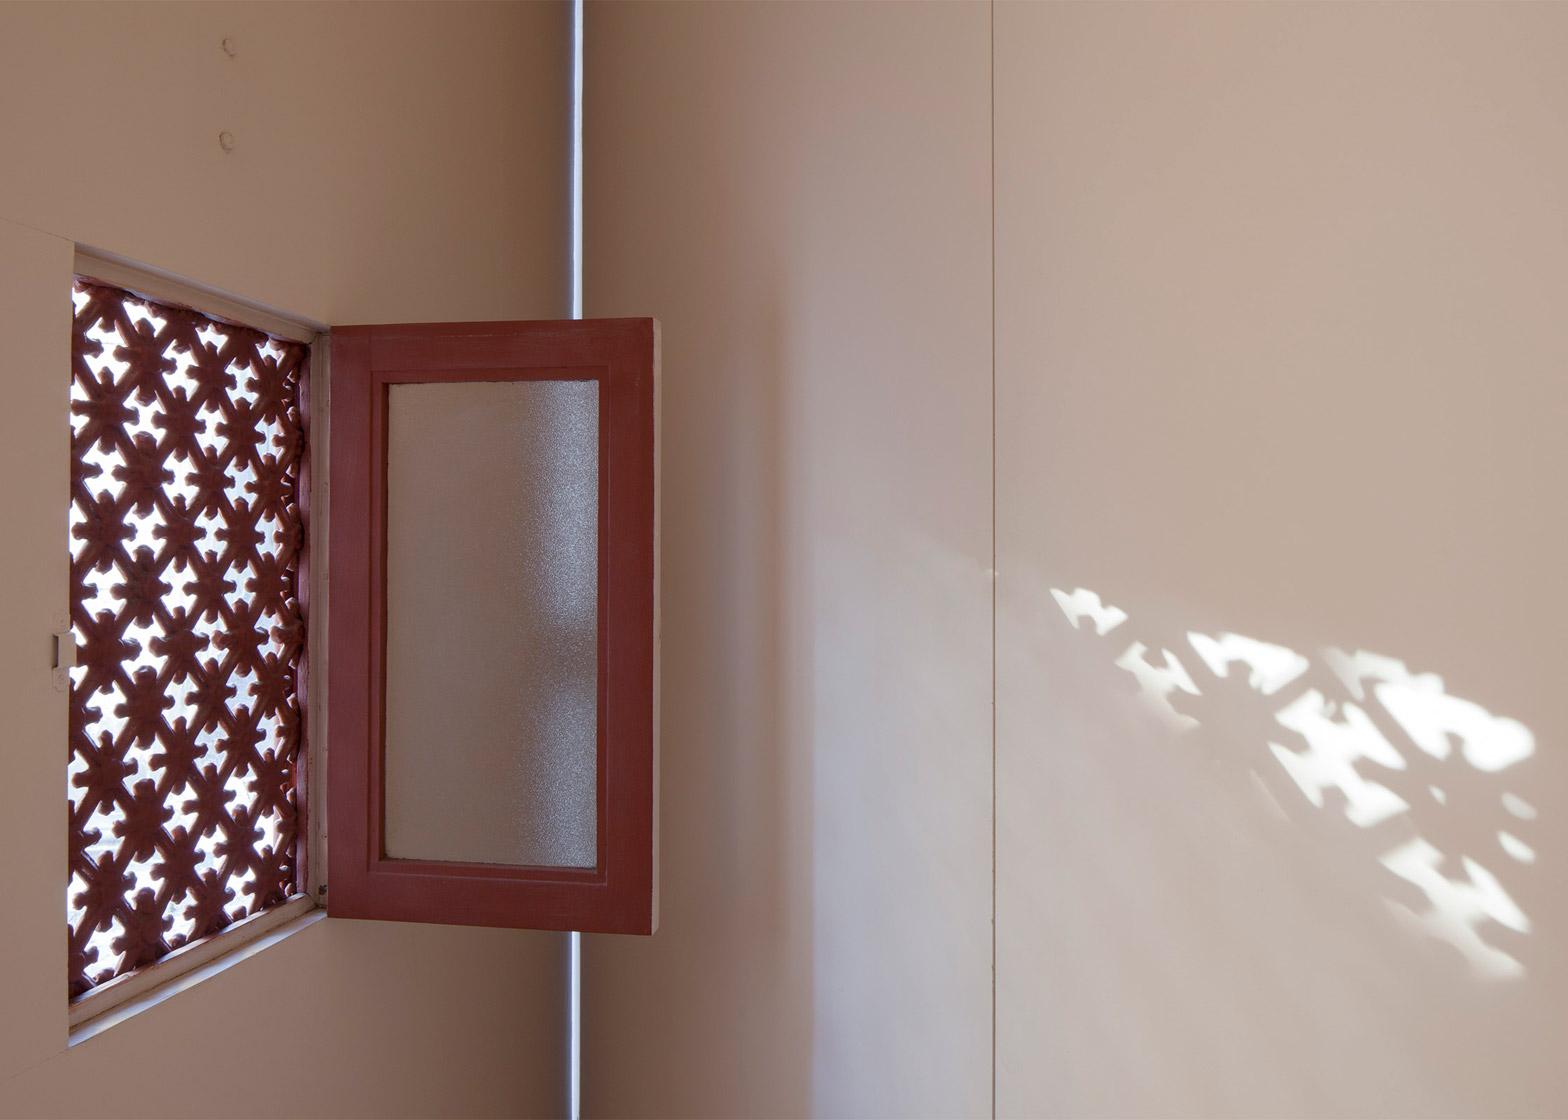 Architecture-courtyard-design-studia-interiors-osnovadesign-osnova-poltava-12